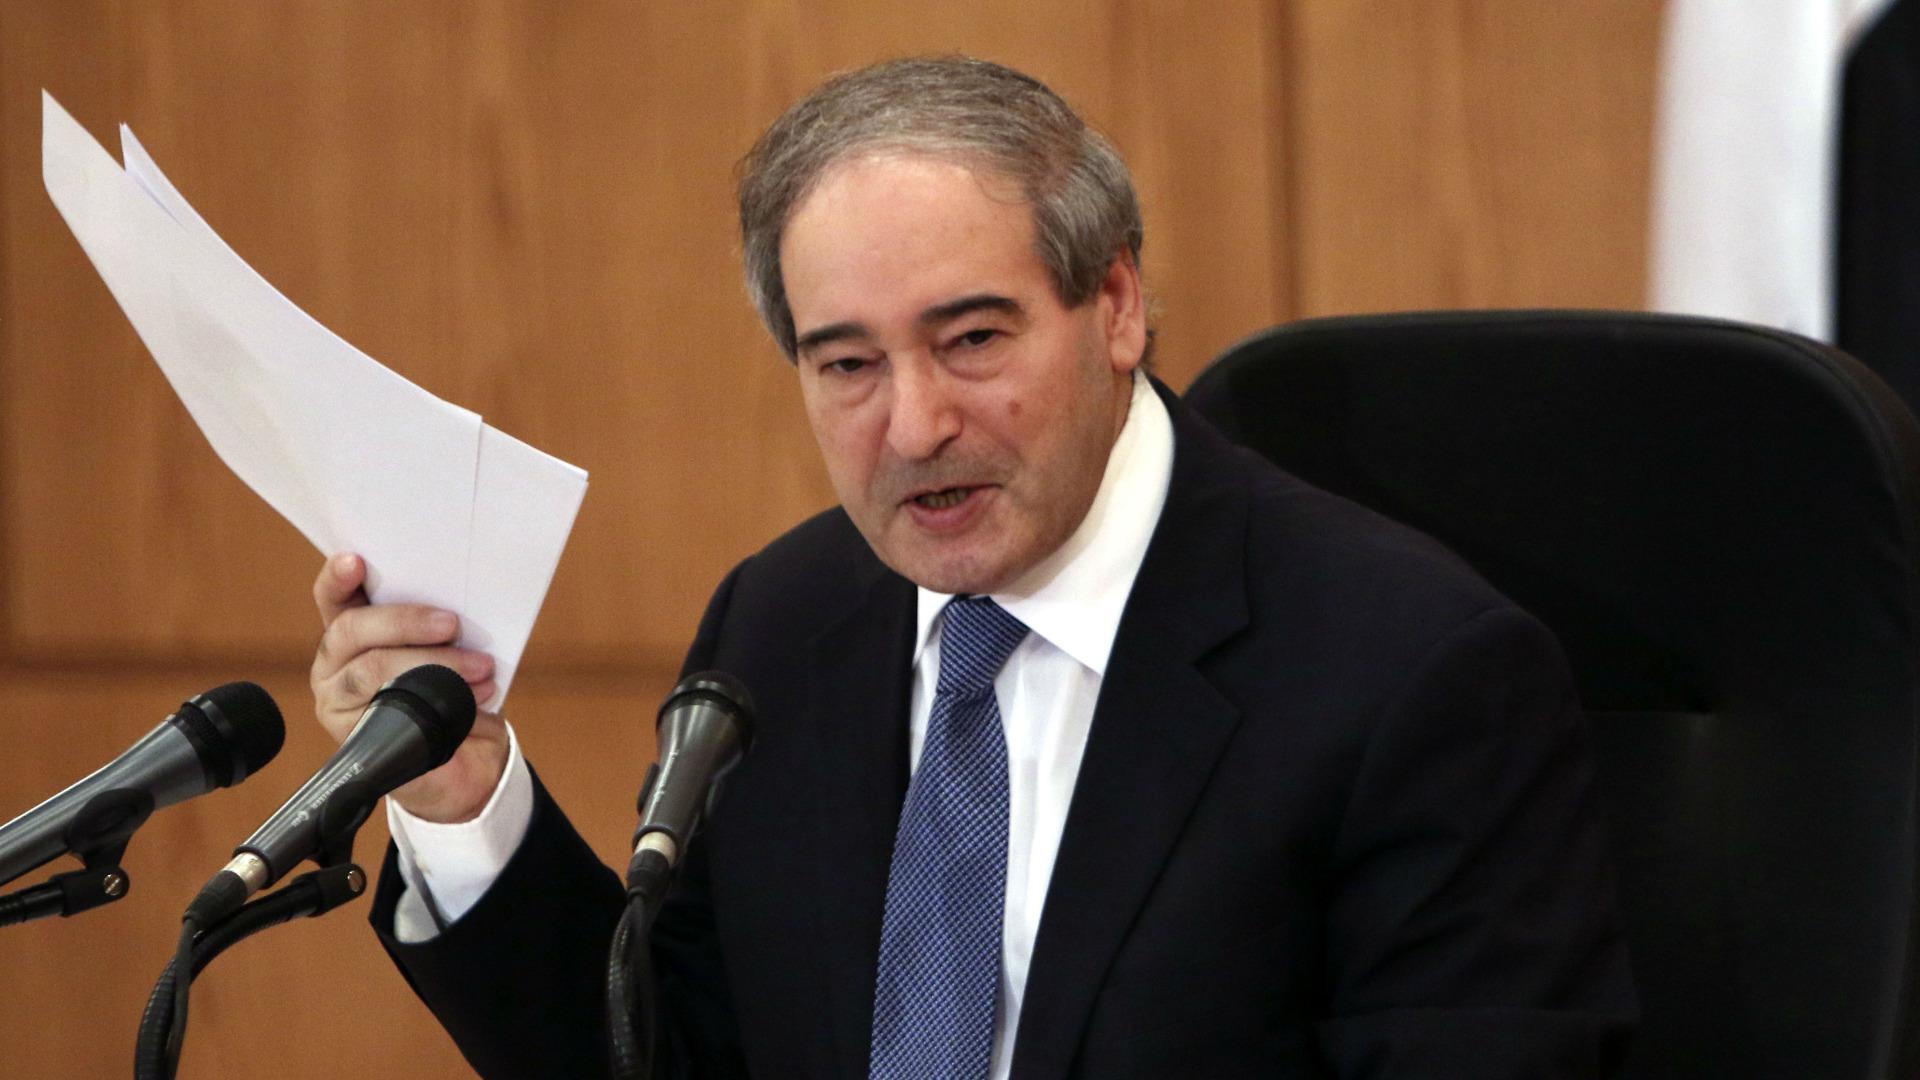 Файзал Мекдад